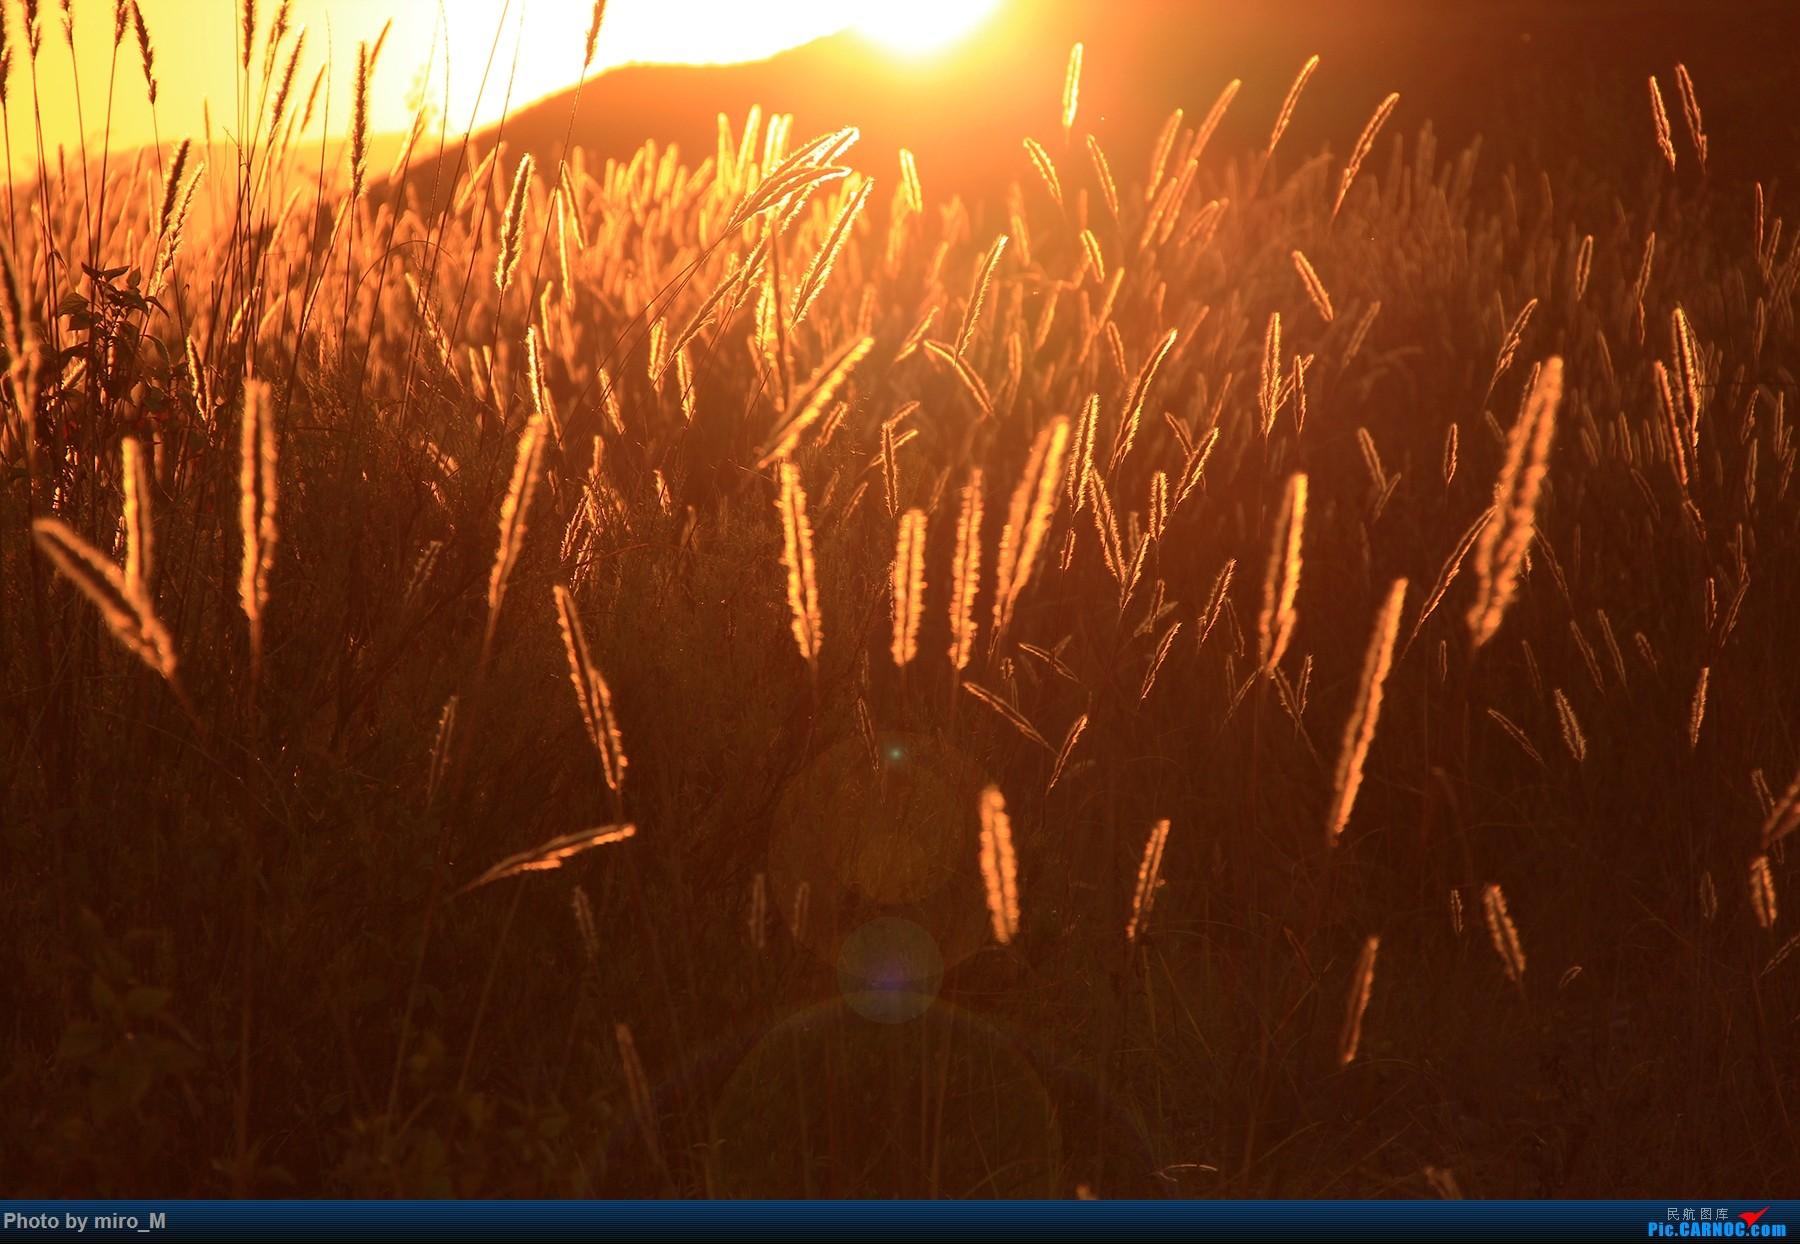 Re:阳光和煦的下午,带老爸一起登上昆明西跑边的大土坡